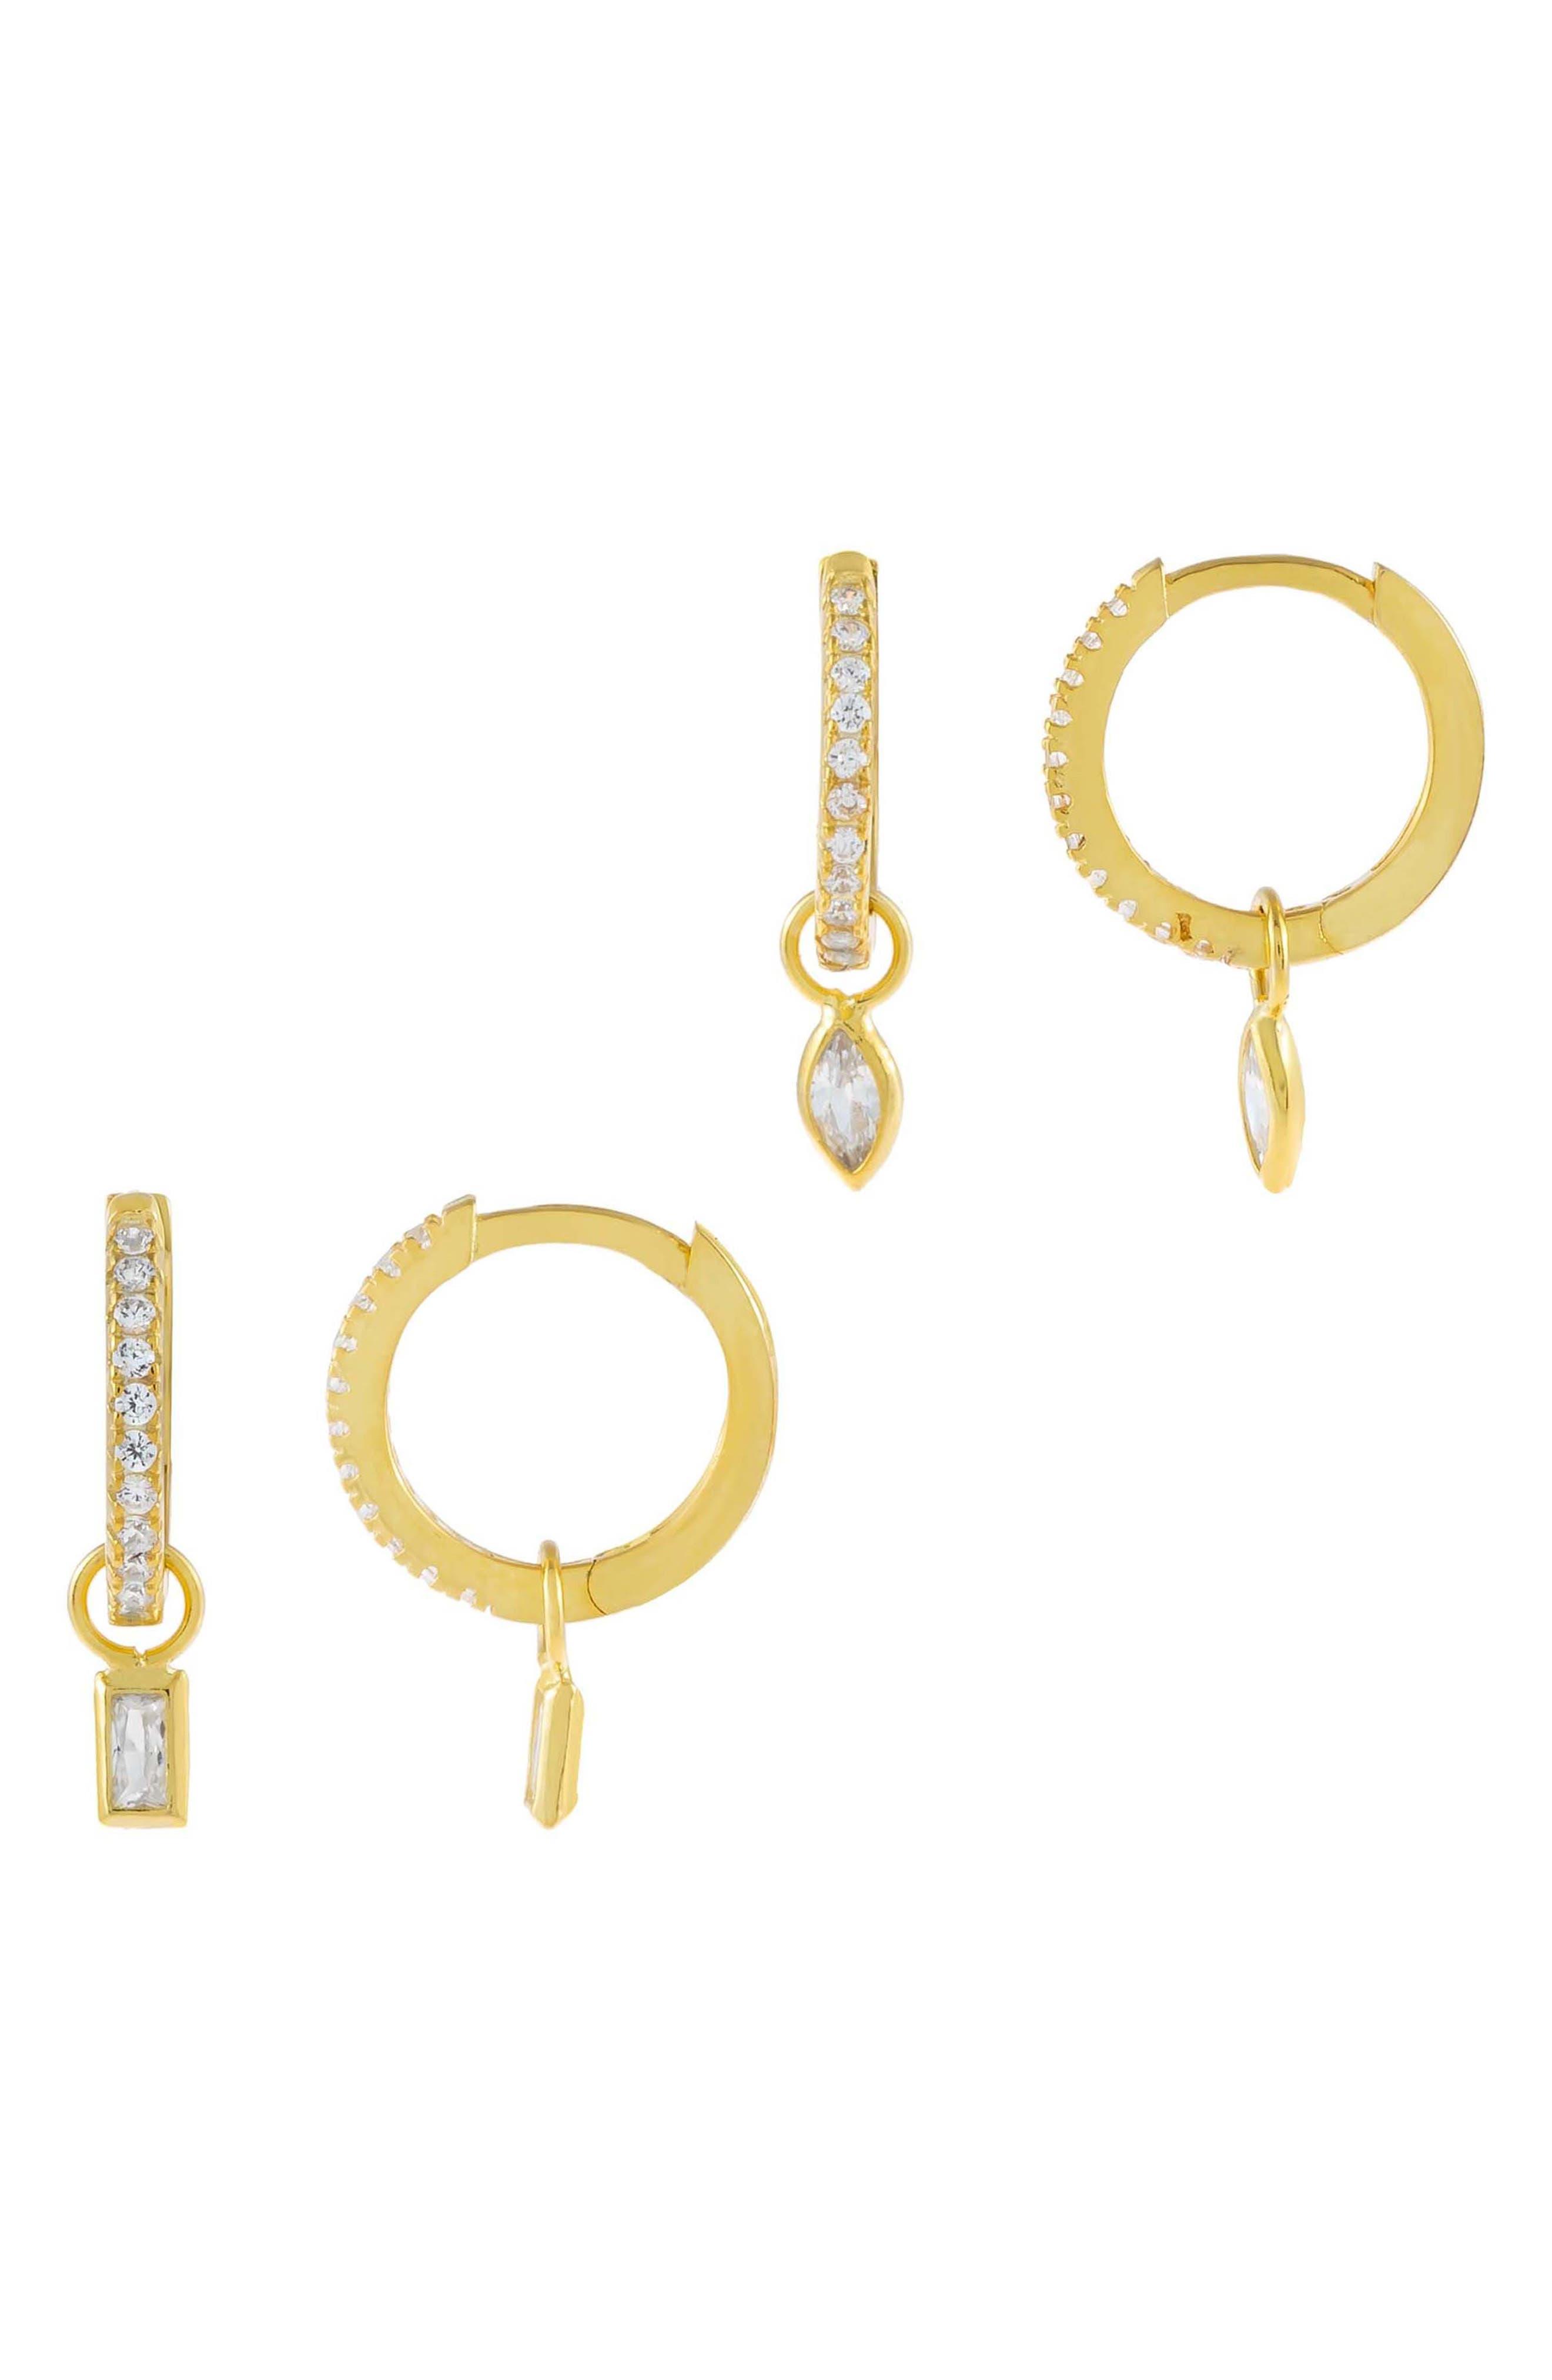 Women's Adina's Jewels Set Of 2 Teardrop & Baguette Drop Huggie Hoop Earrings Set